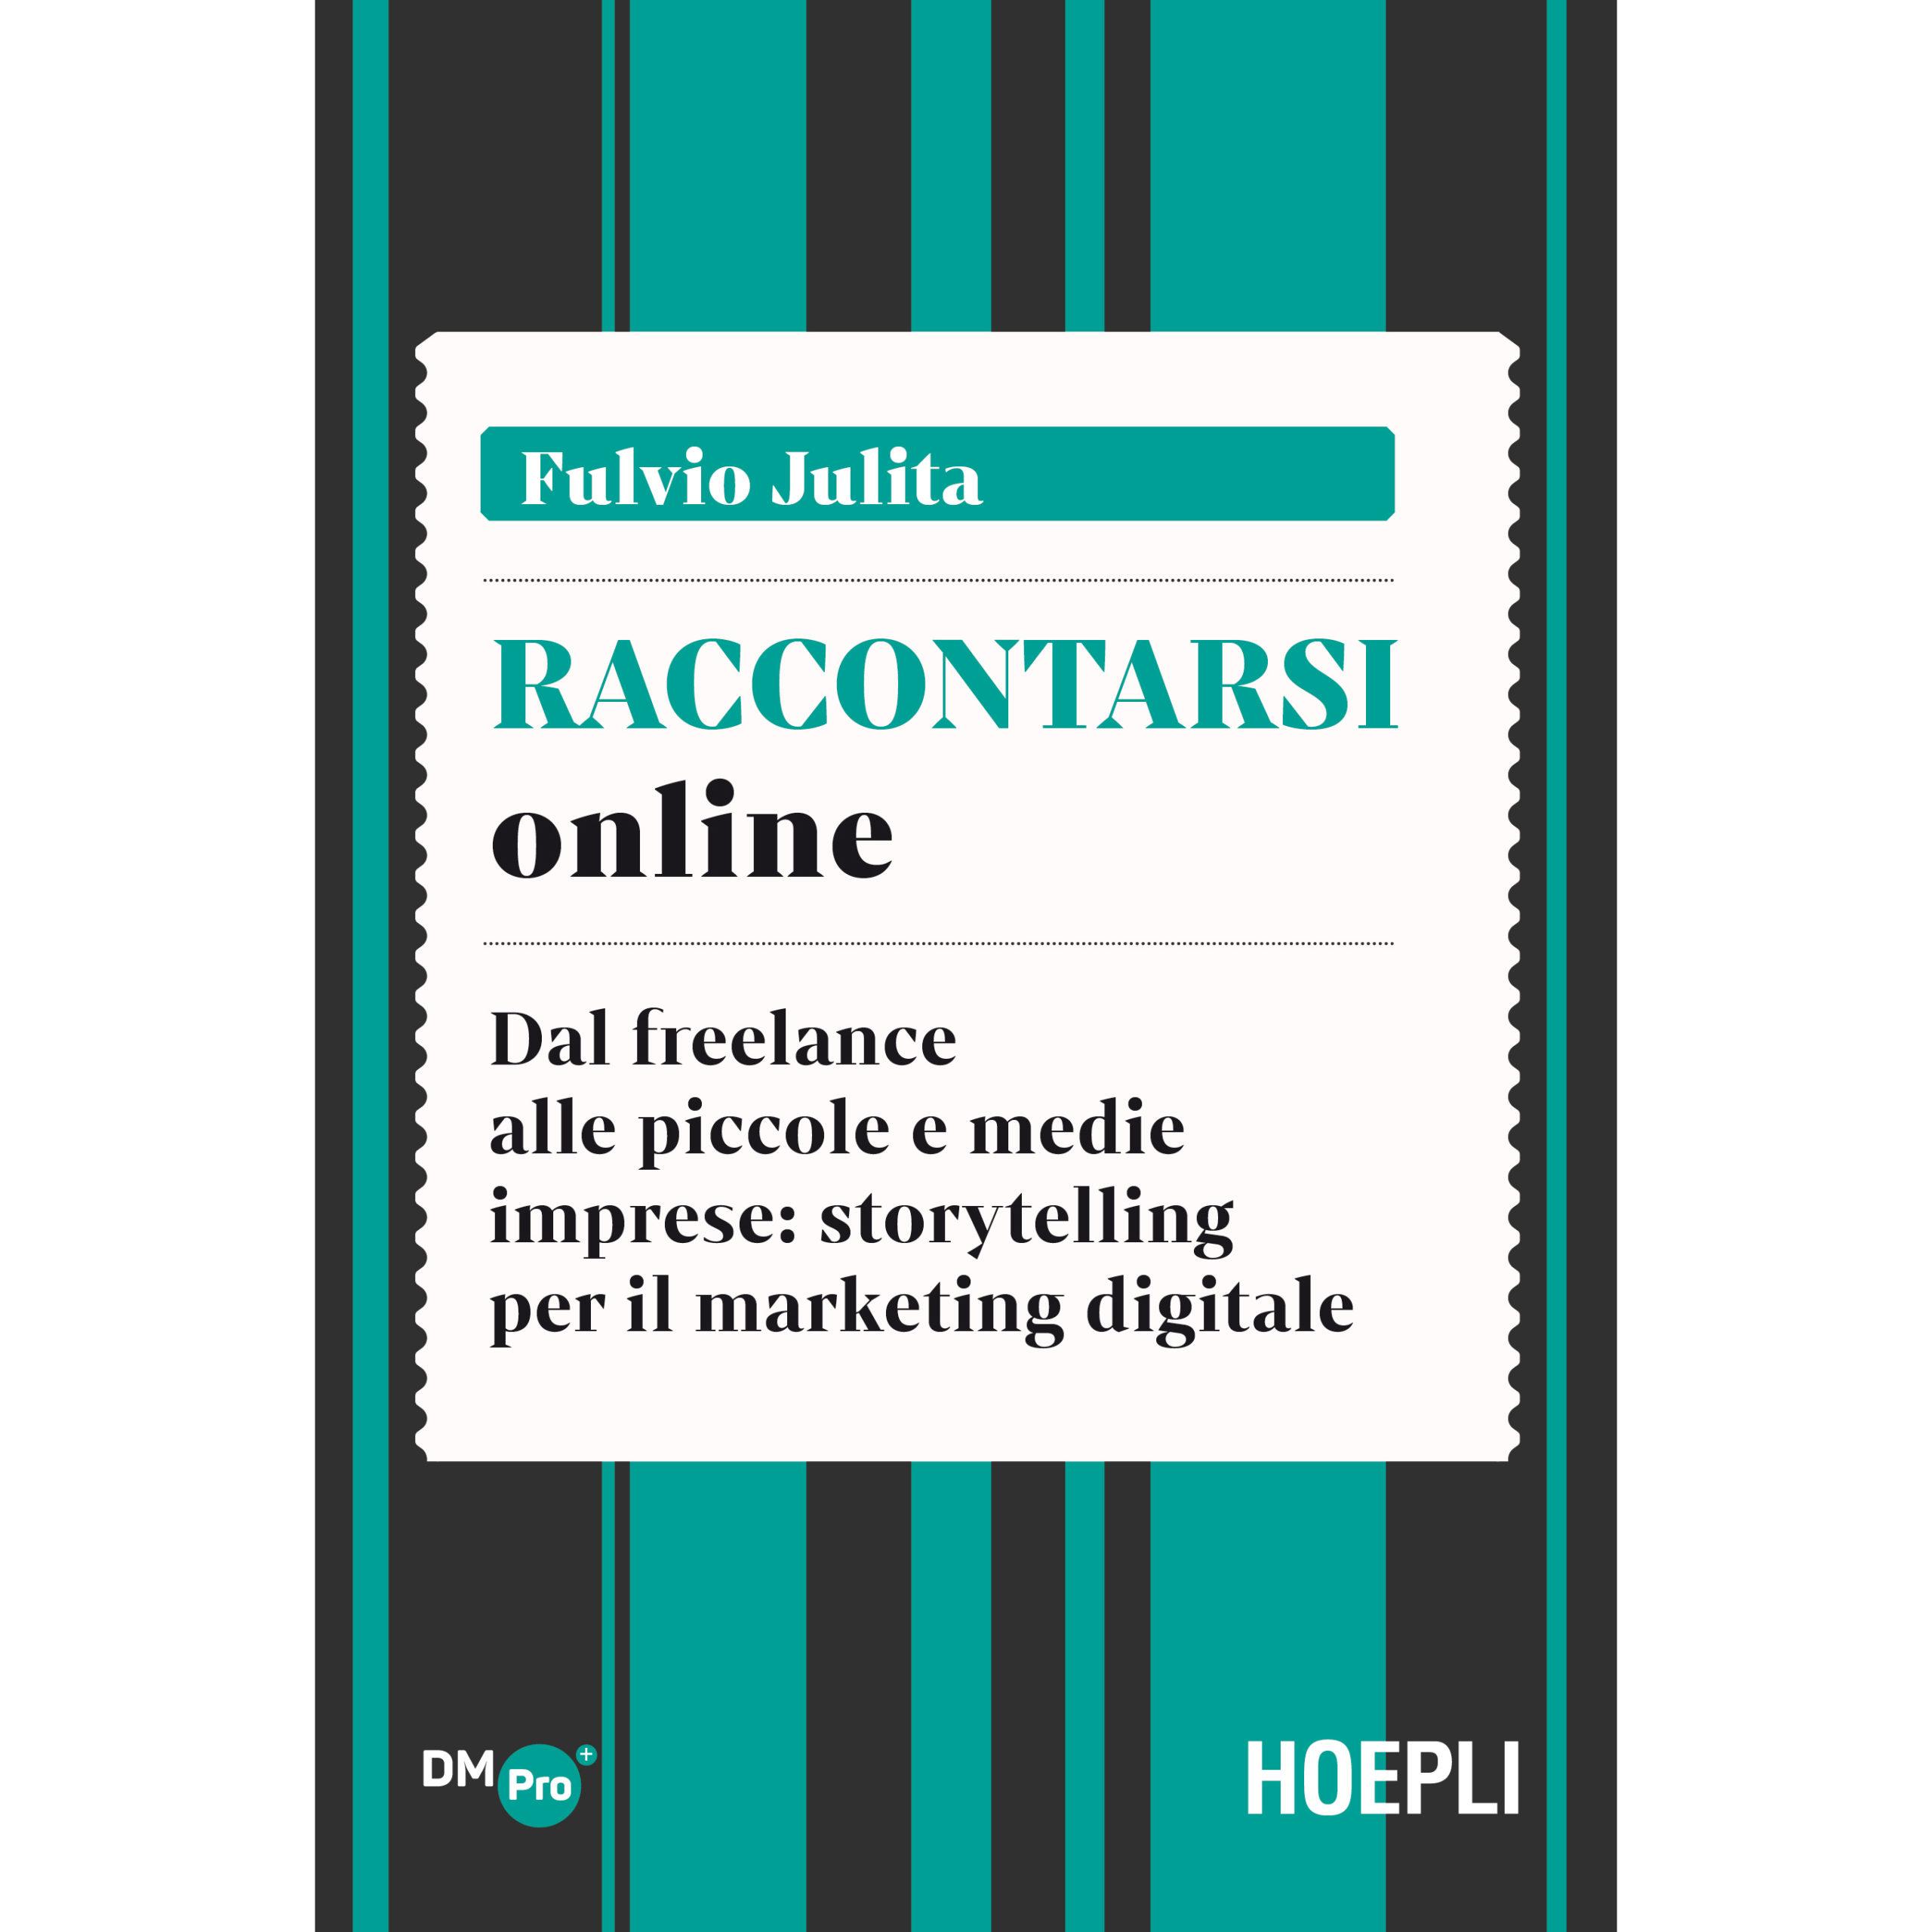 RACCONTARSI ONLINE Fulvio Julita